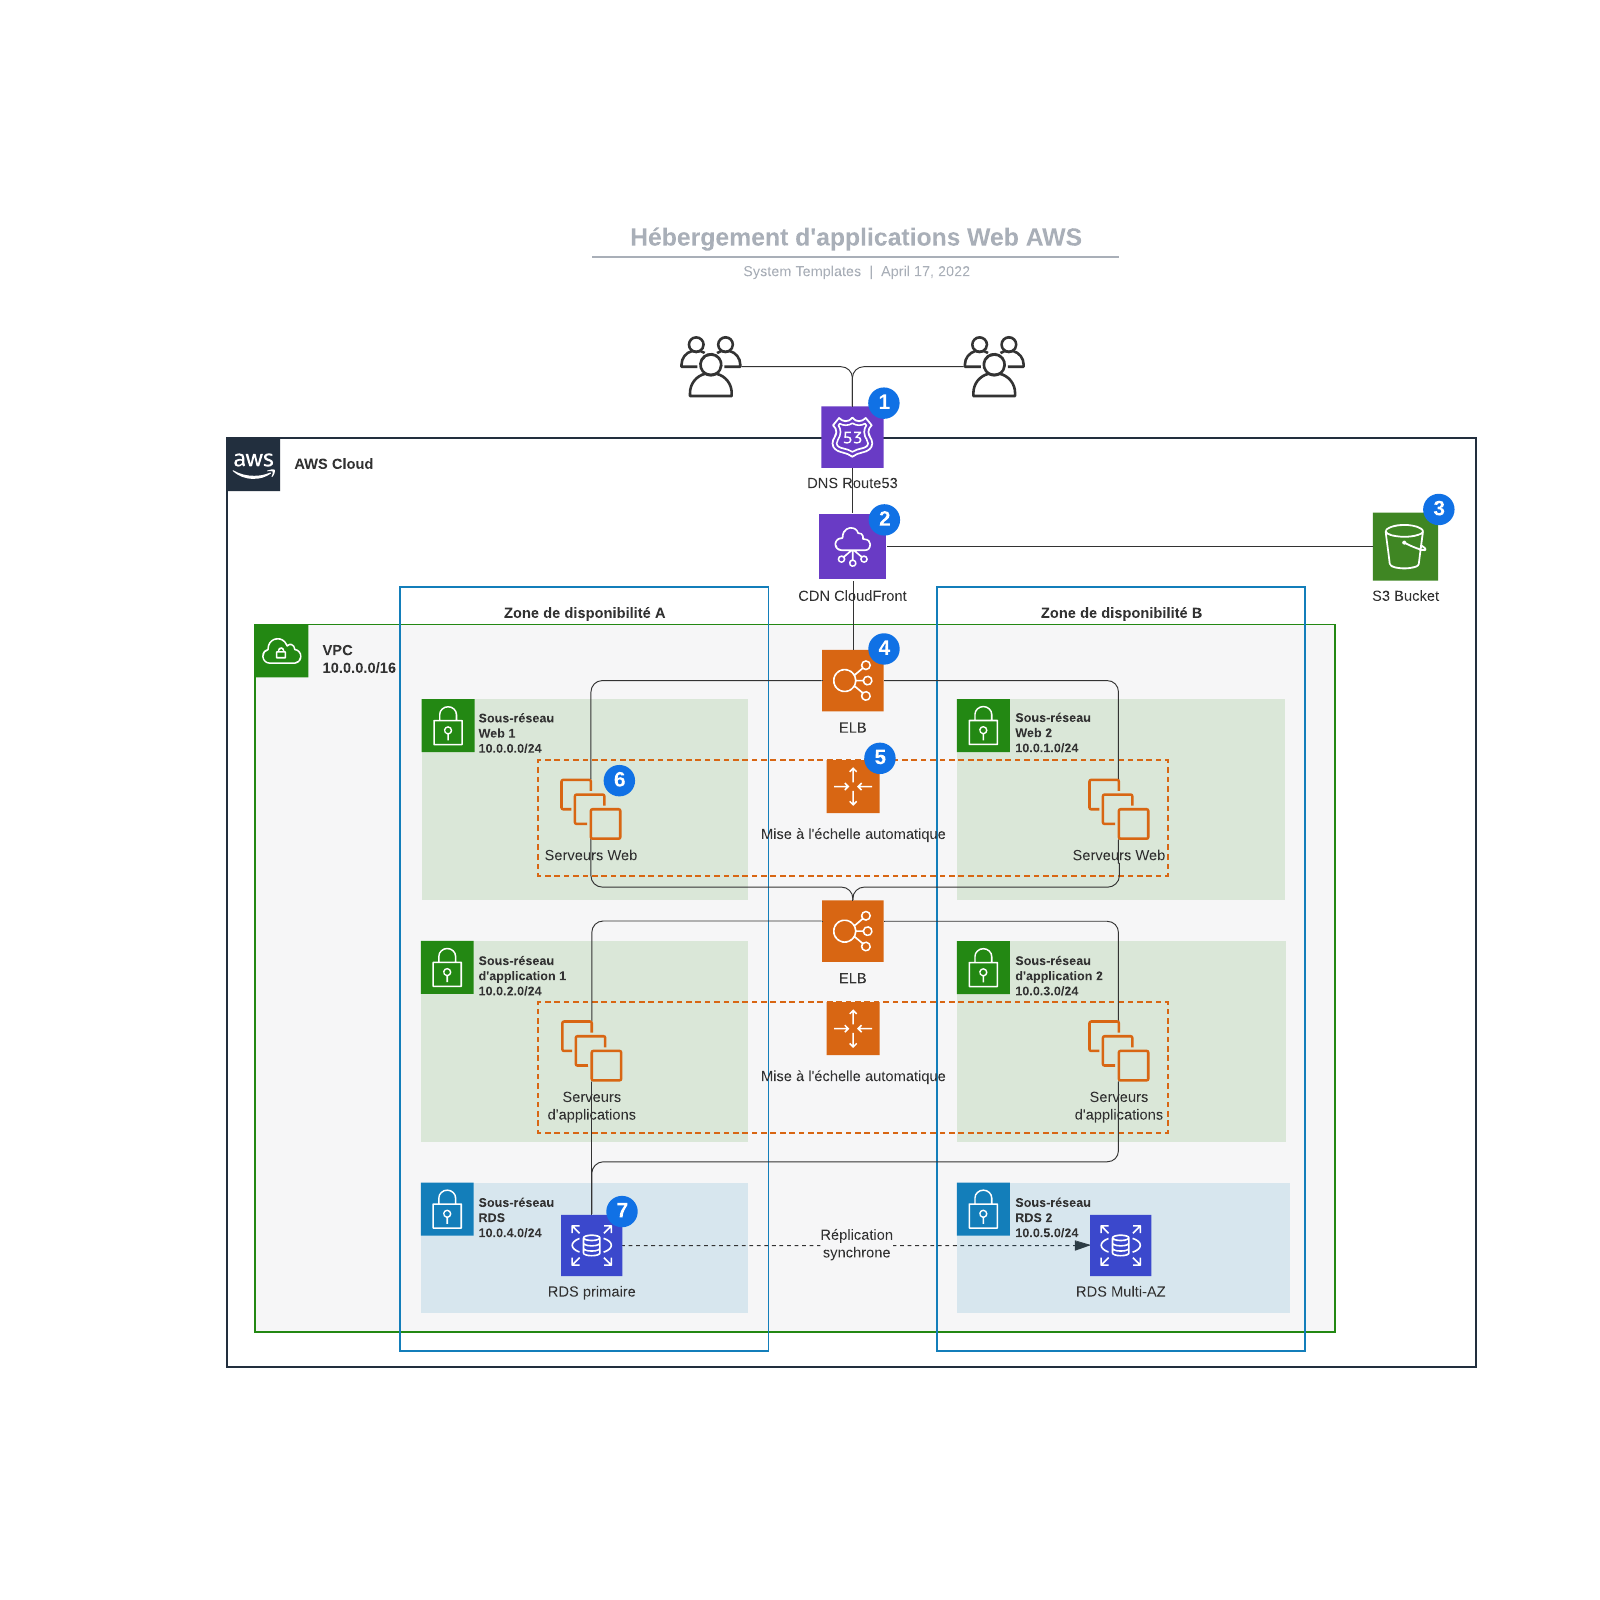 exemple d'hébergement d'applications Web AWS